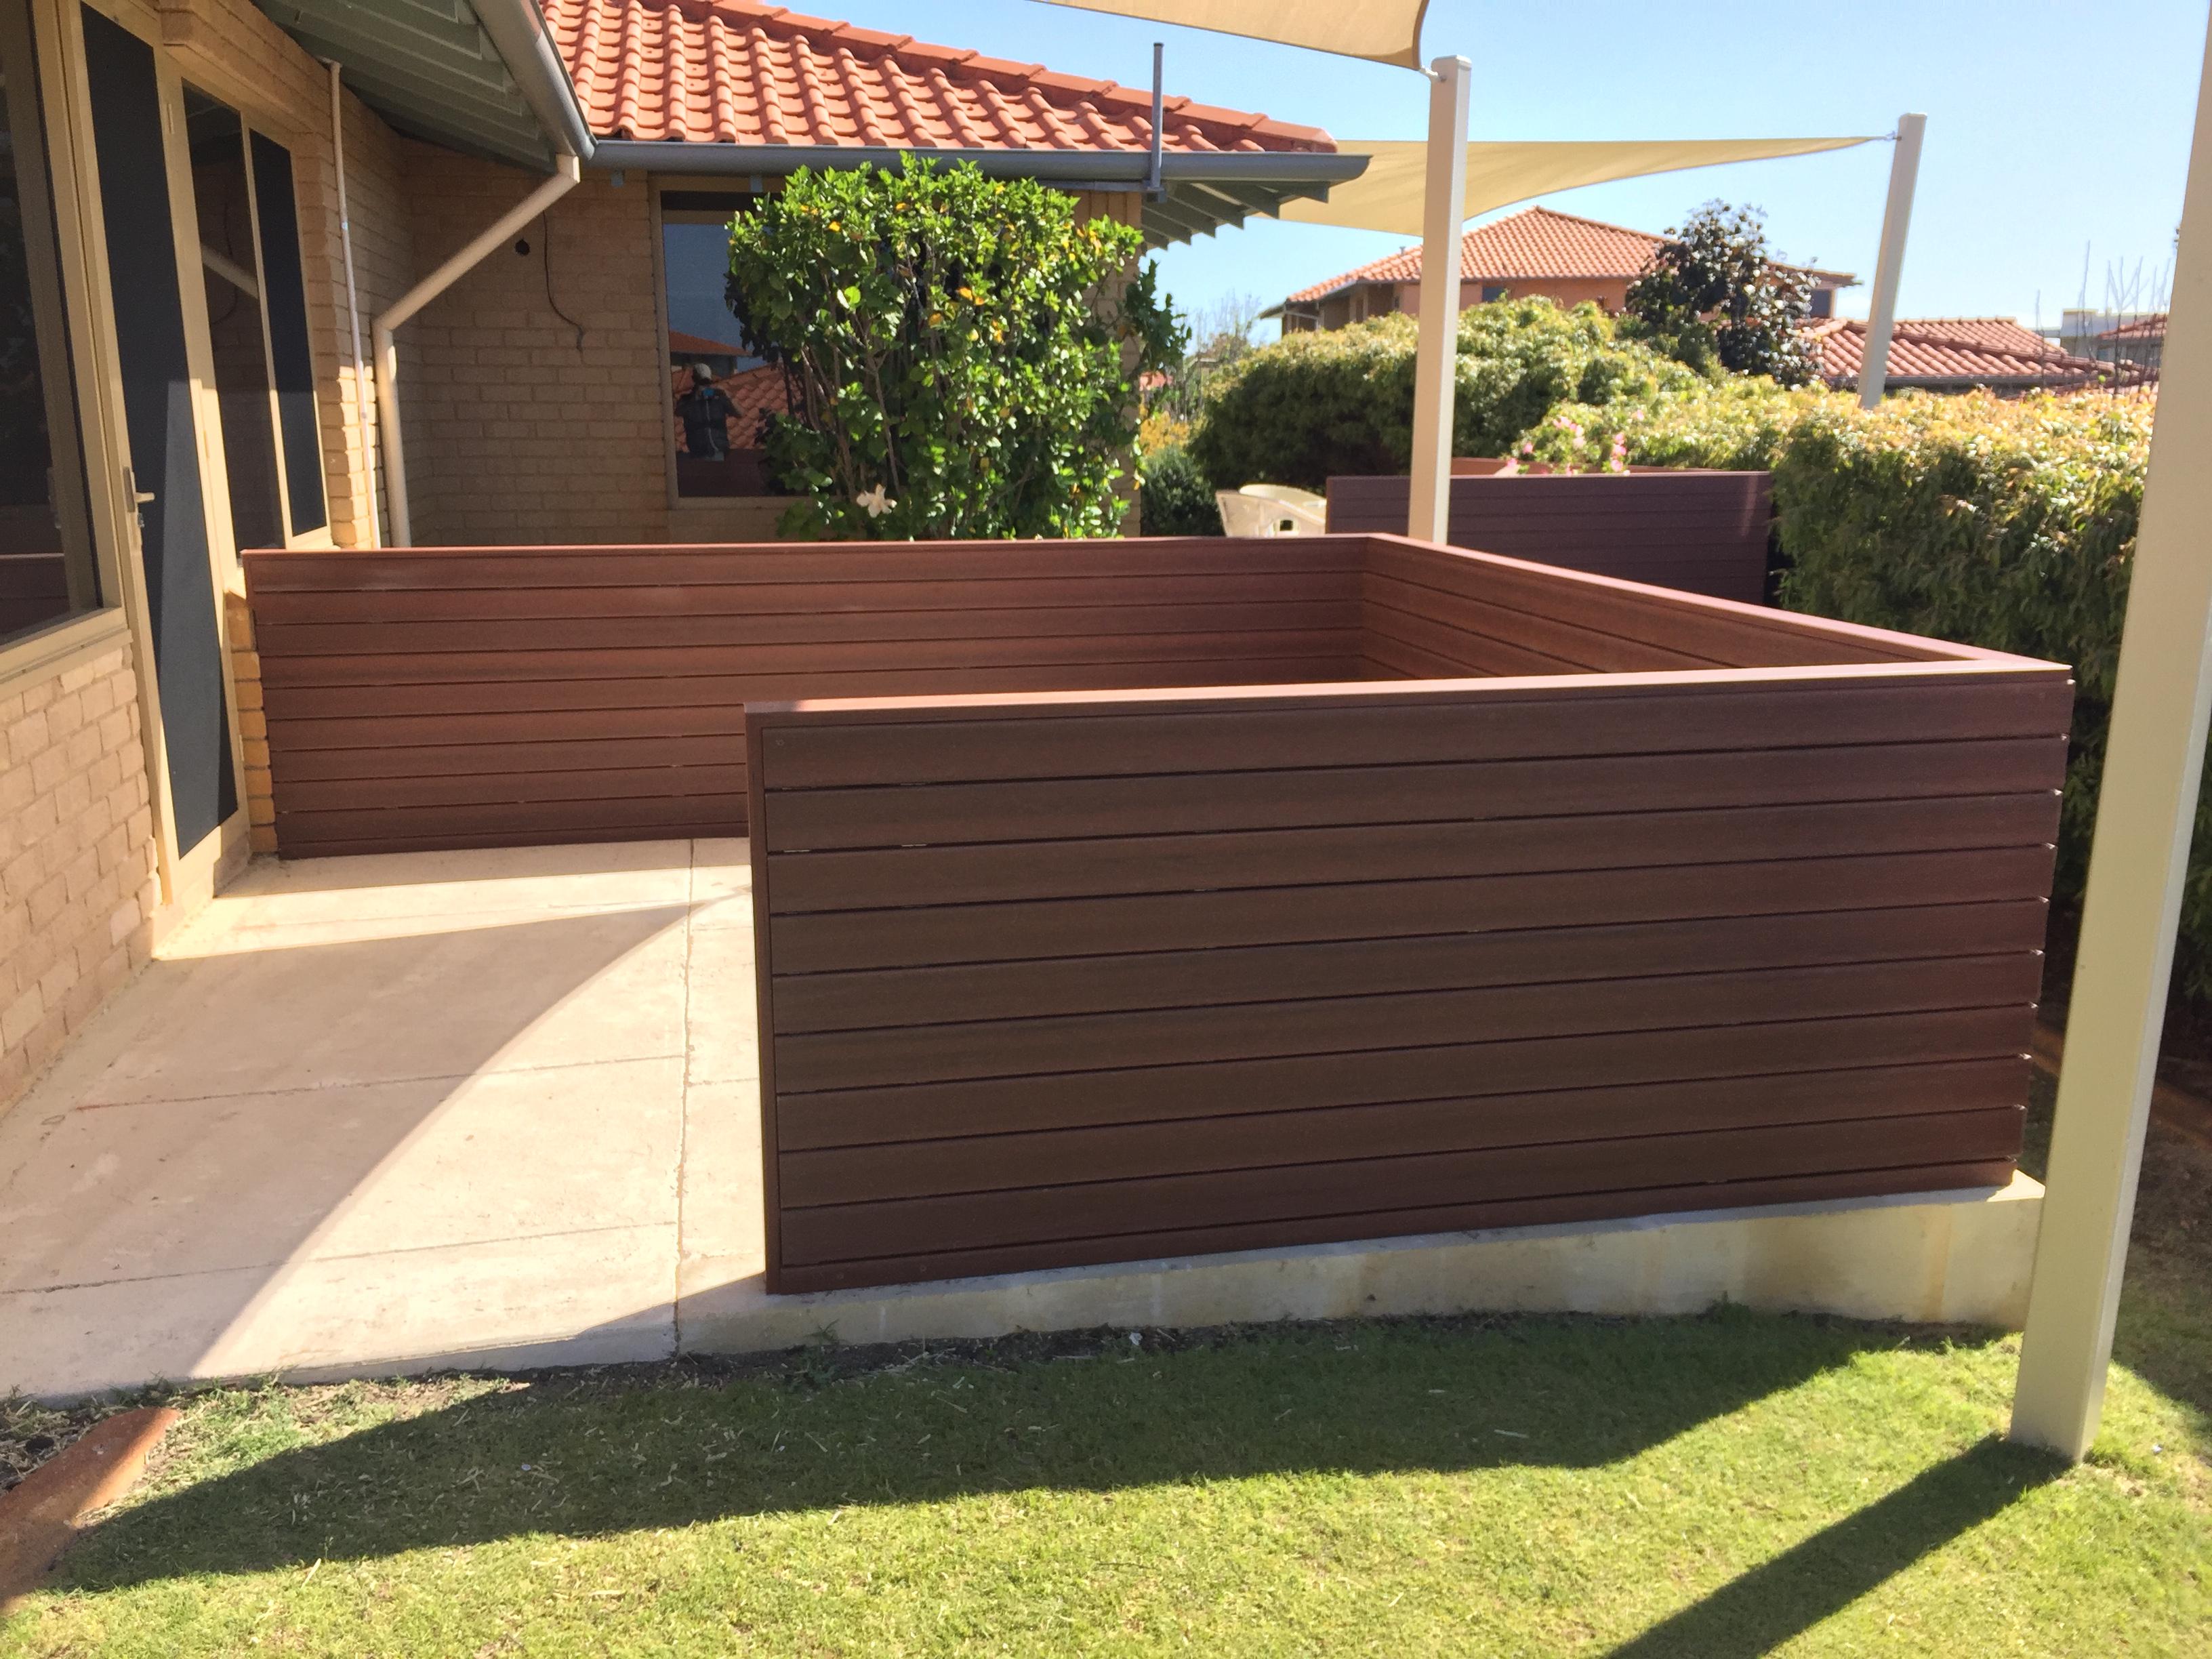 Modwood composite decking perth for Composite decking brands